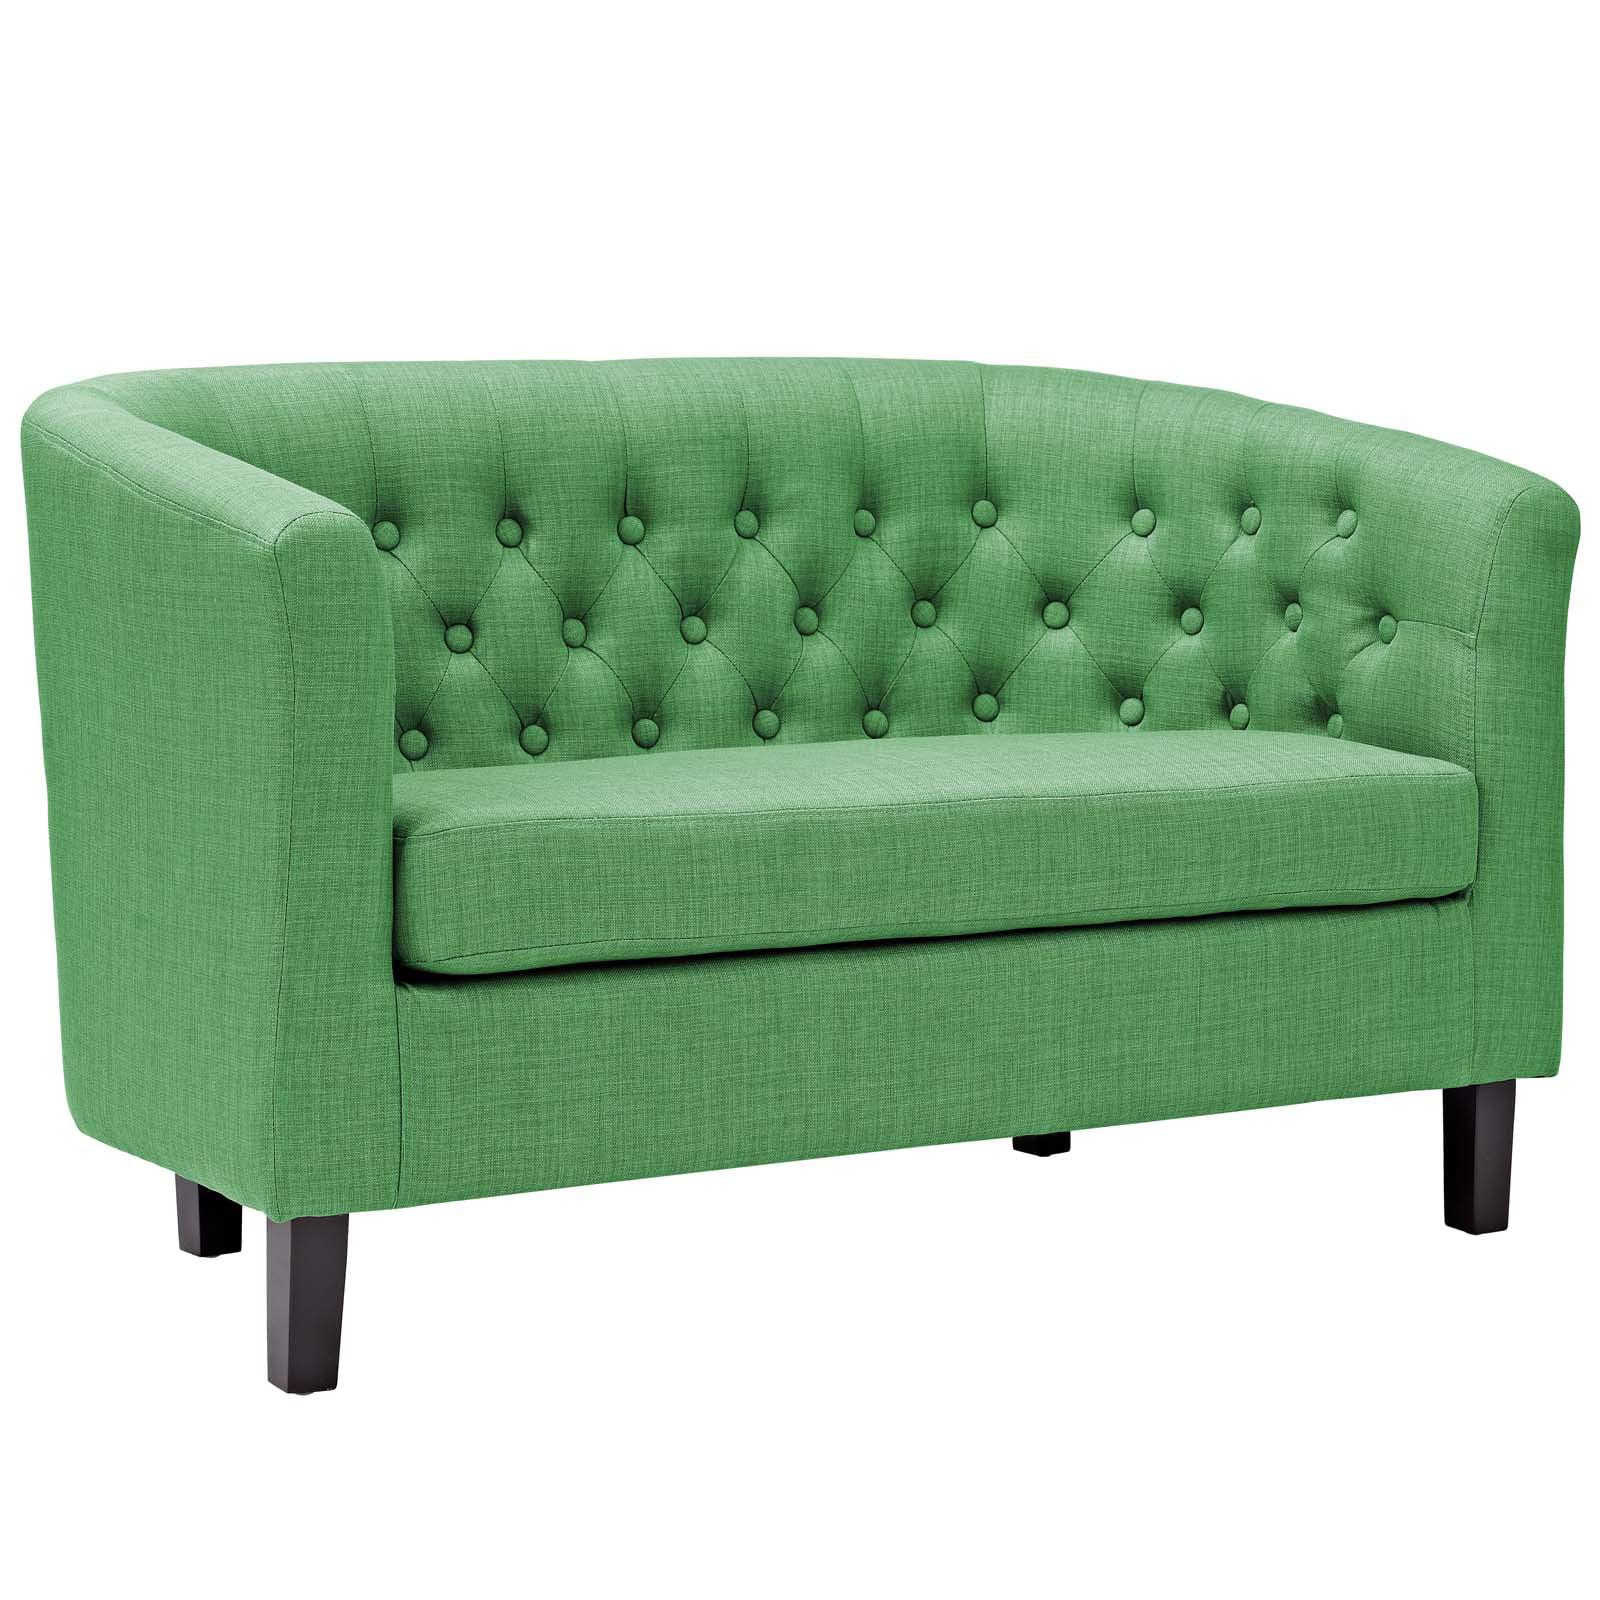 Modern Contemporary Urban Design Living Lounge Room Loveseat Sofa, Green, Fabric